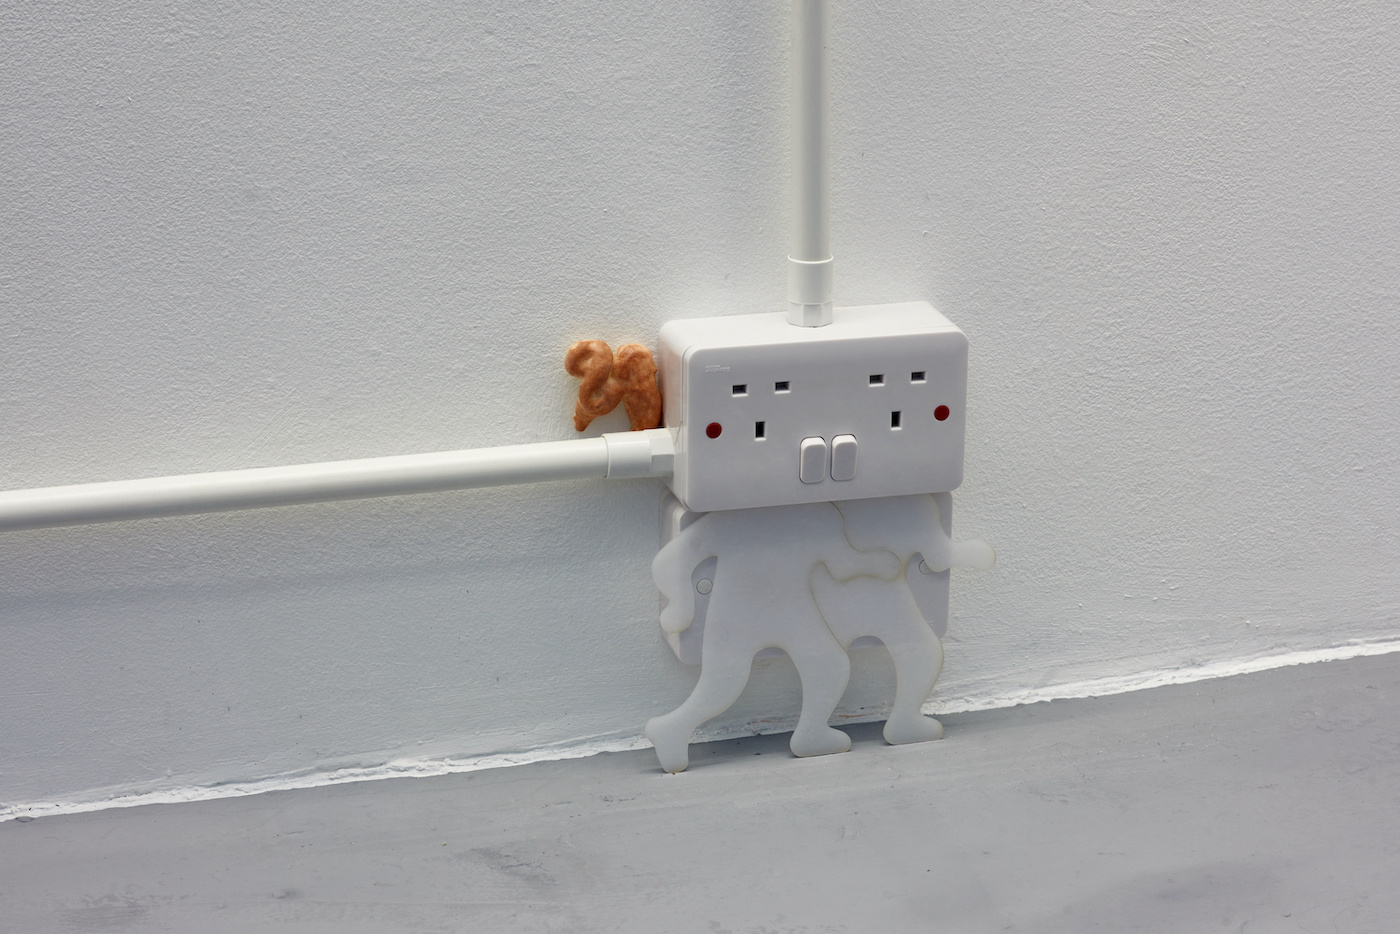 Kara Chin, Shocked Plugs II, 2021. Plug sockets, Perspex, PVC conduit, expandable foam, oil paint. 22 x 17 x 6 cm. Photographer: Jonathan Bassett.